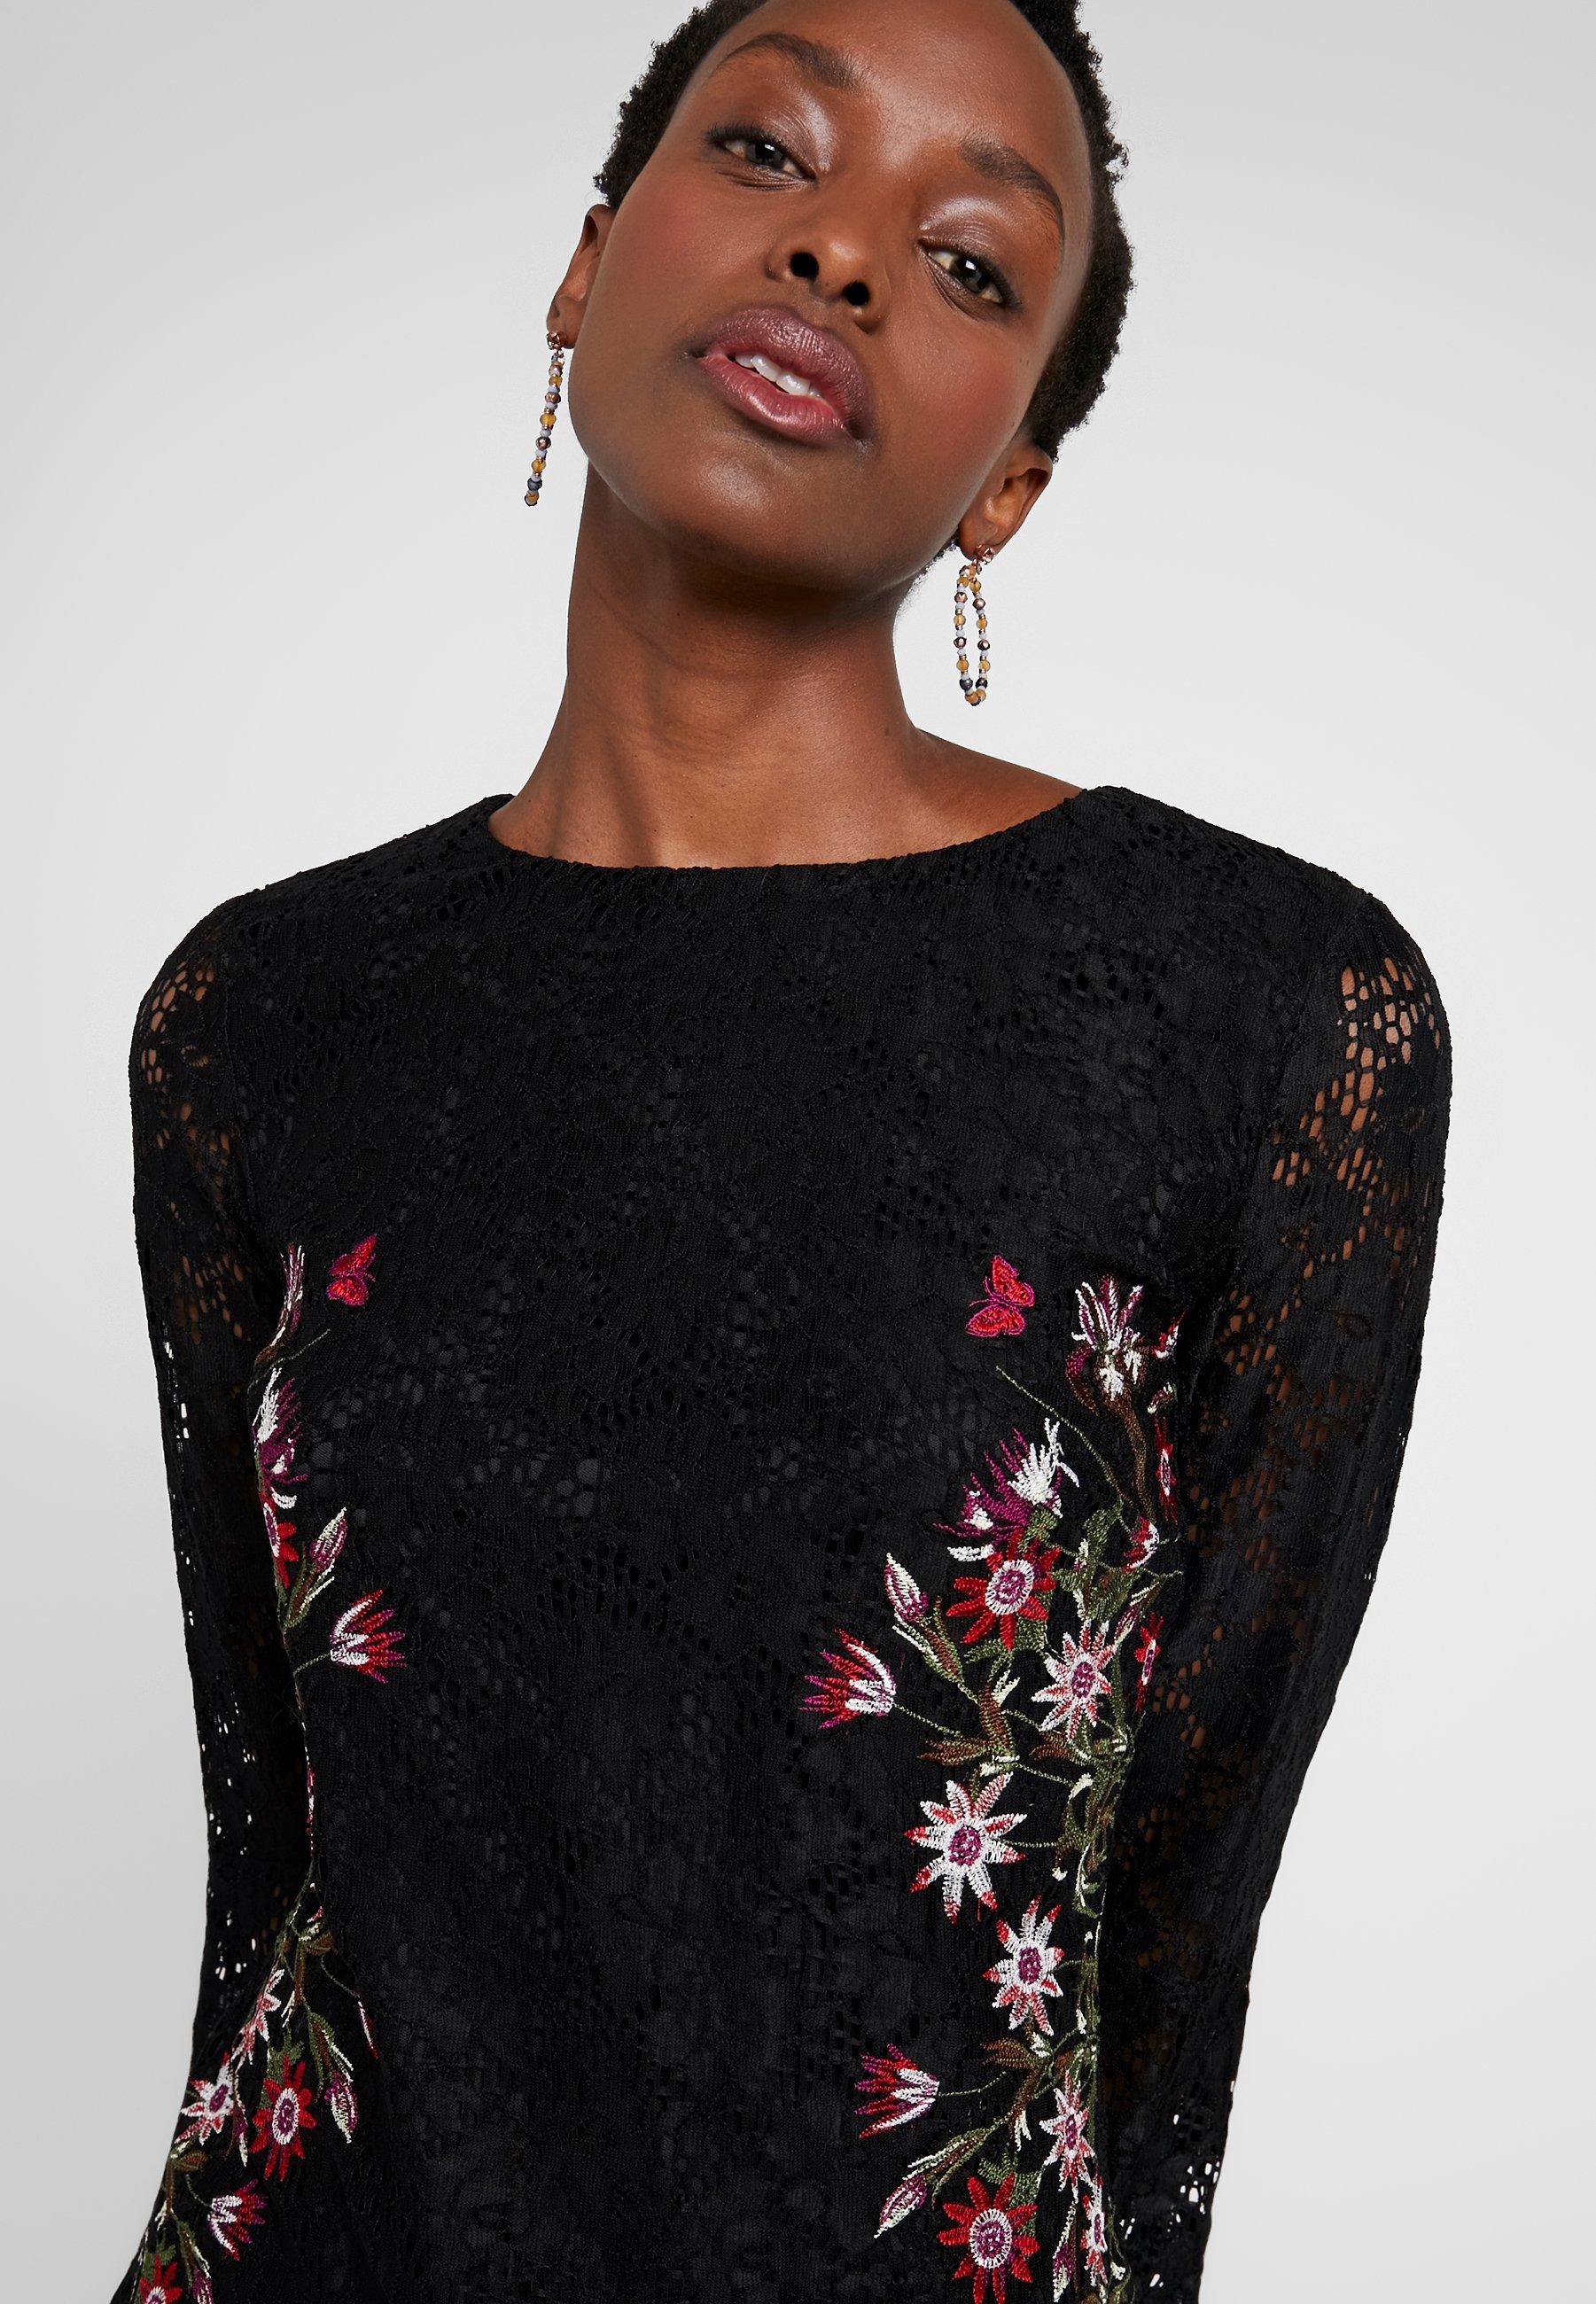 Desigual | Kjøp klær, kjoler og vesker DESIGUAL hos Zalando